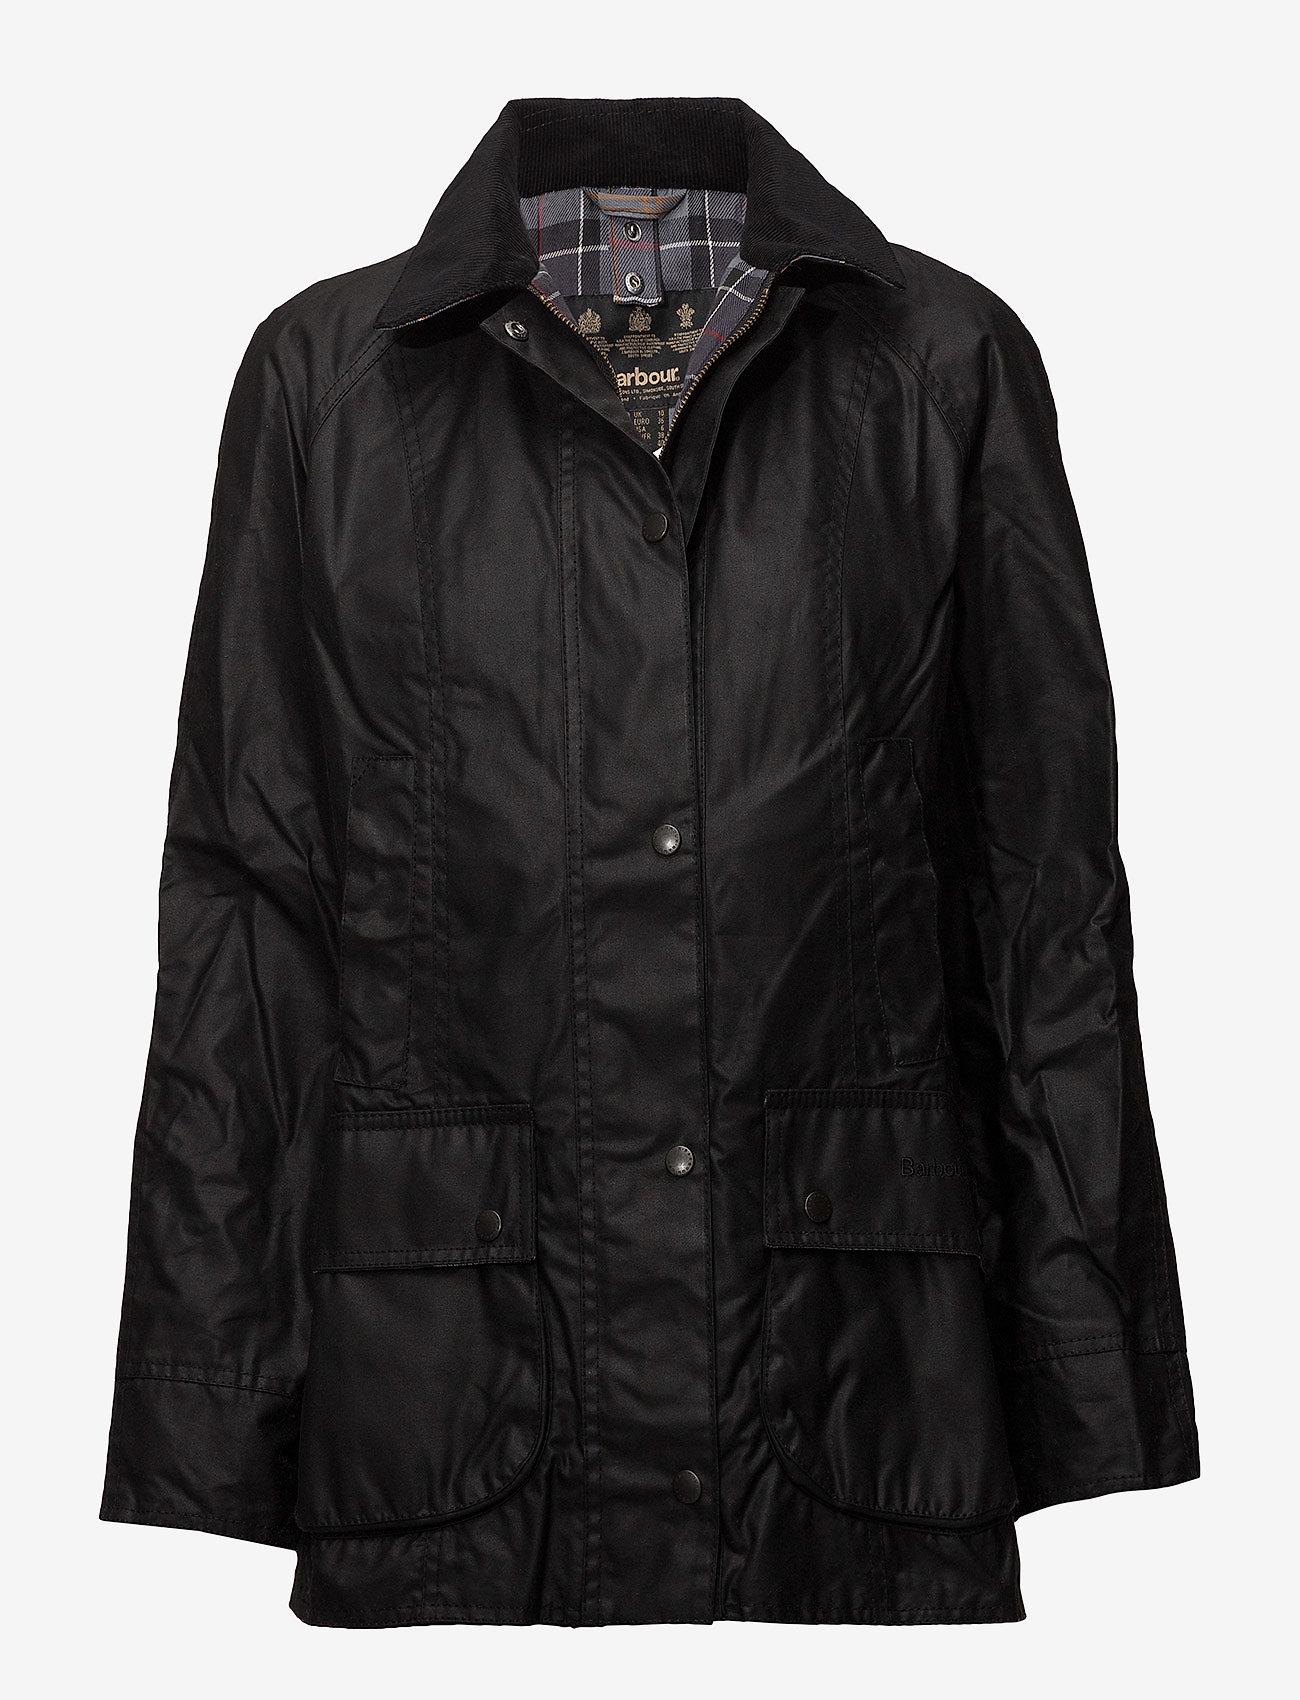 Barbour - Barbour Beadnell Wax Jacket - lette jakker - black - 0